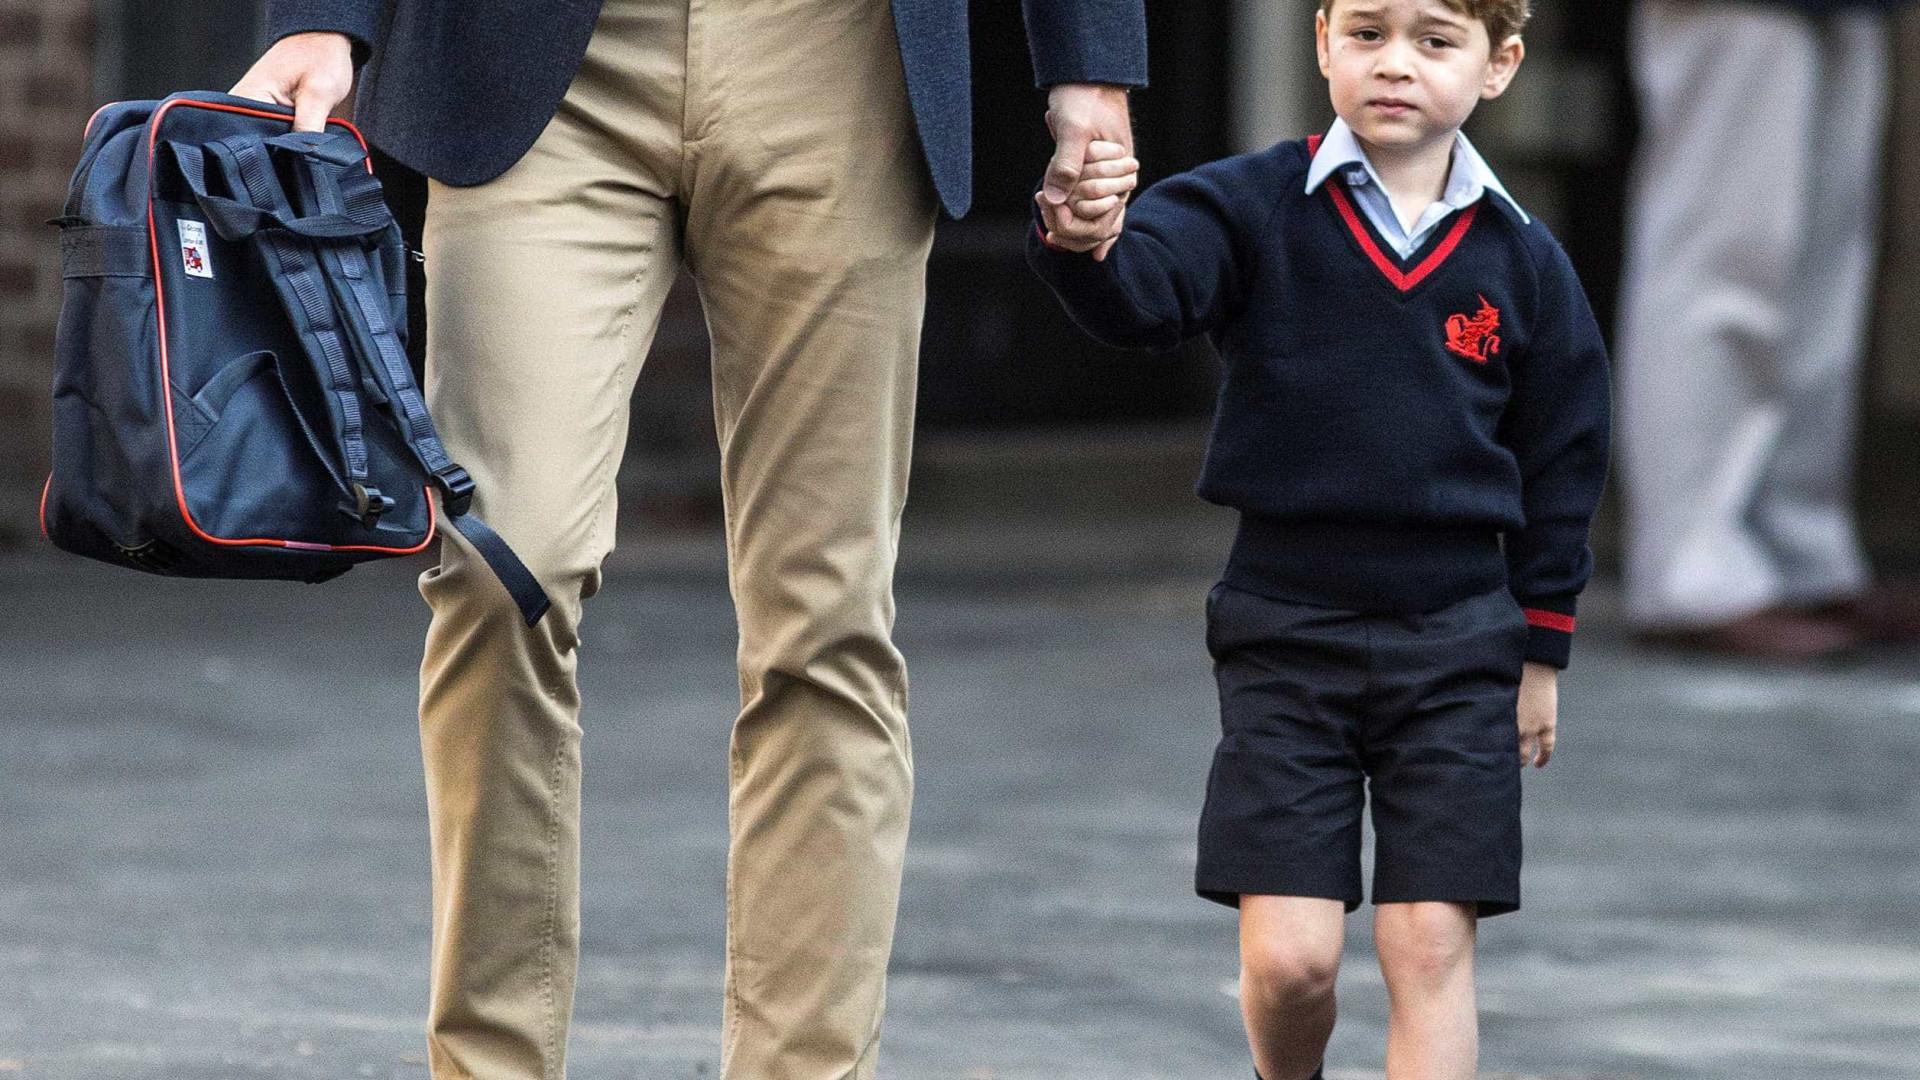 Príncipe George pede carro de polícia ao Papai Noel